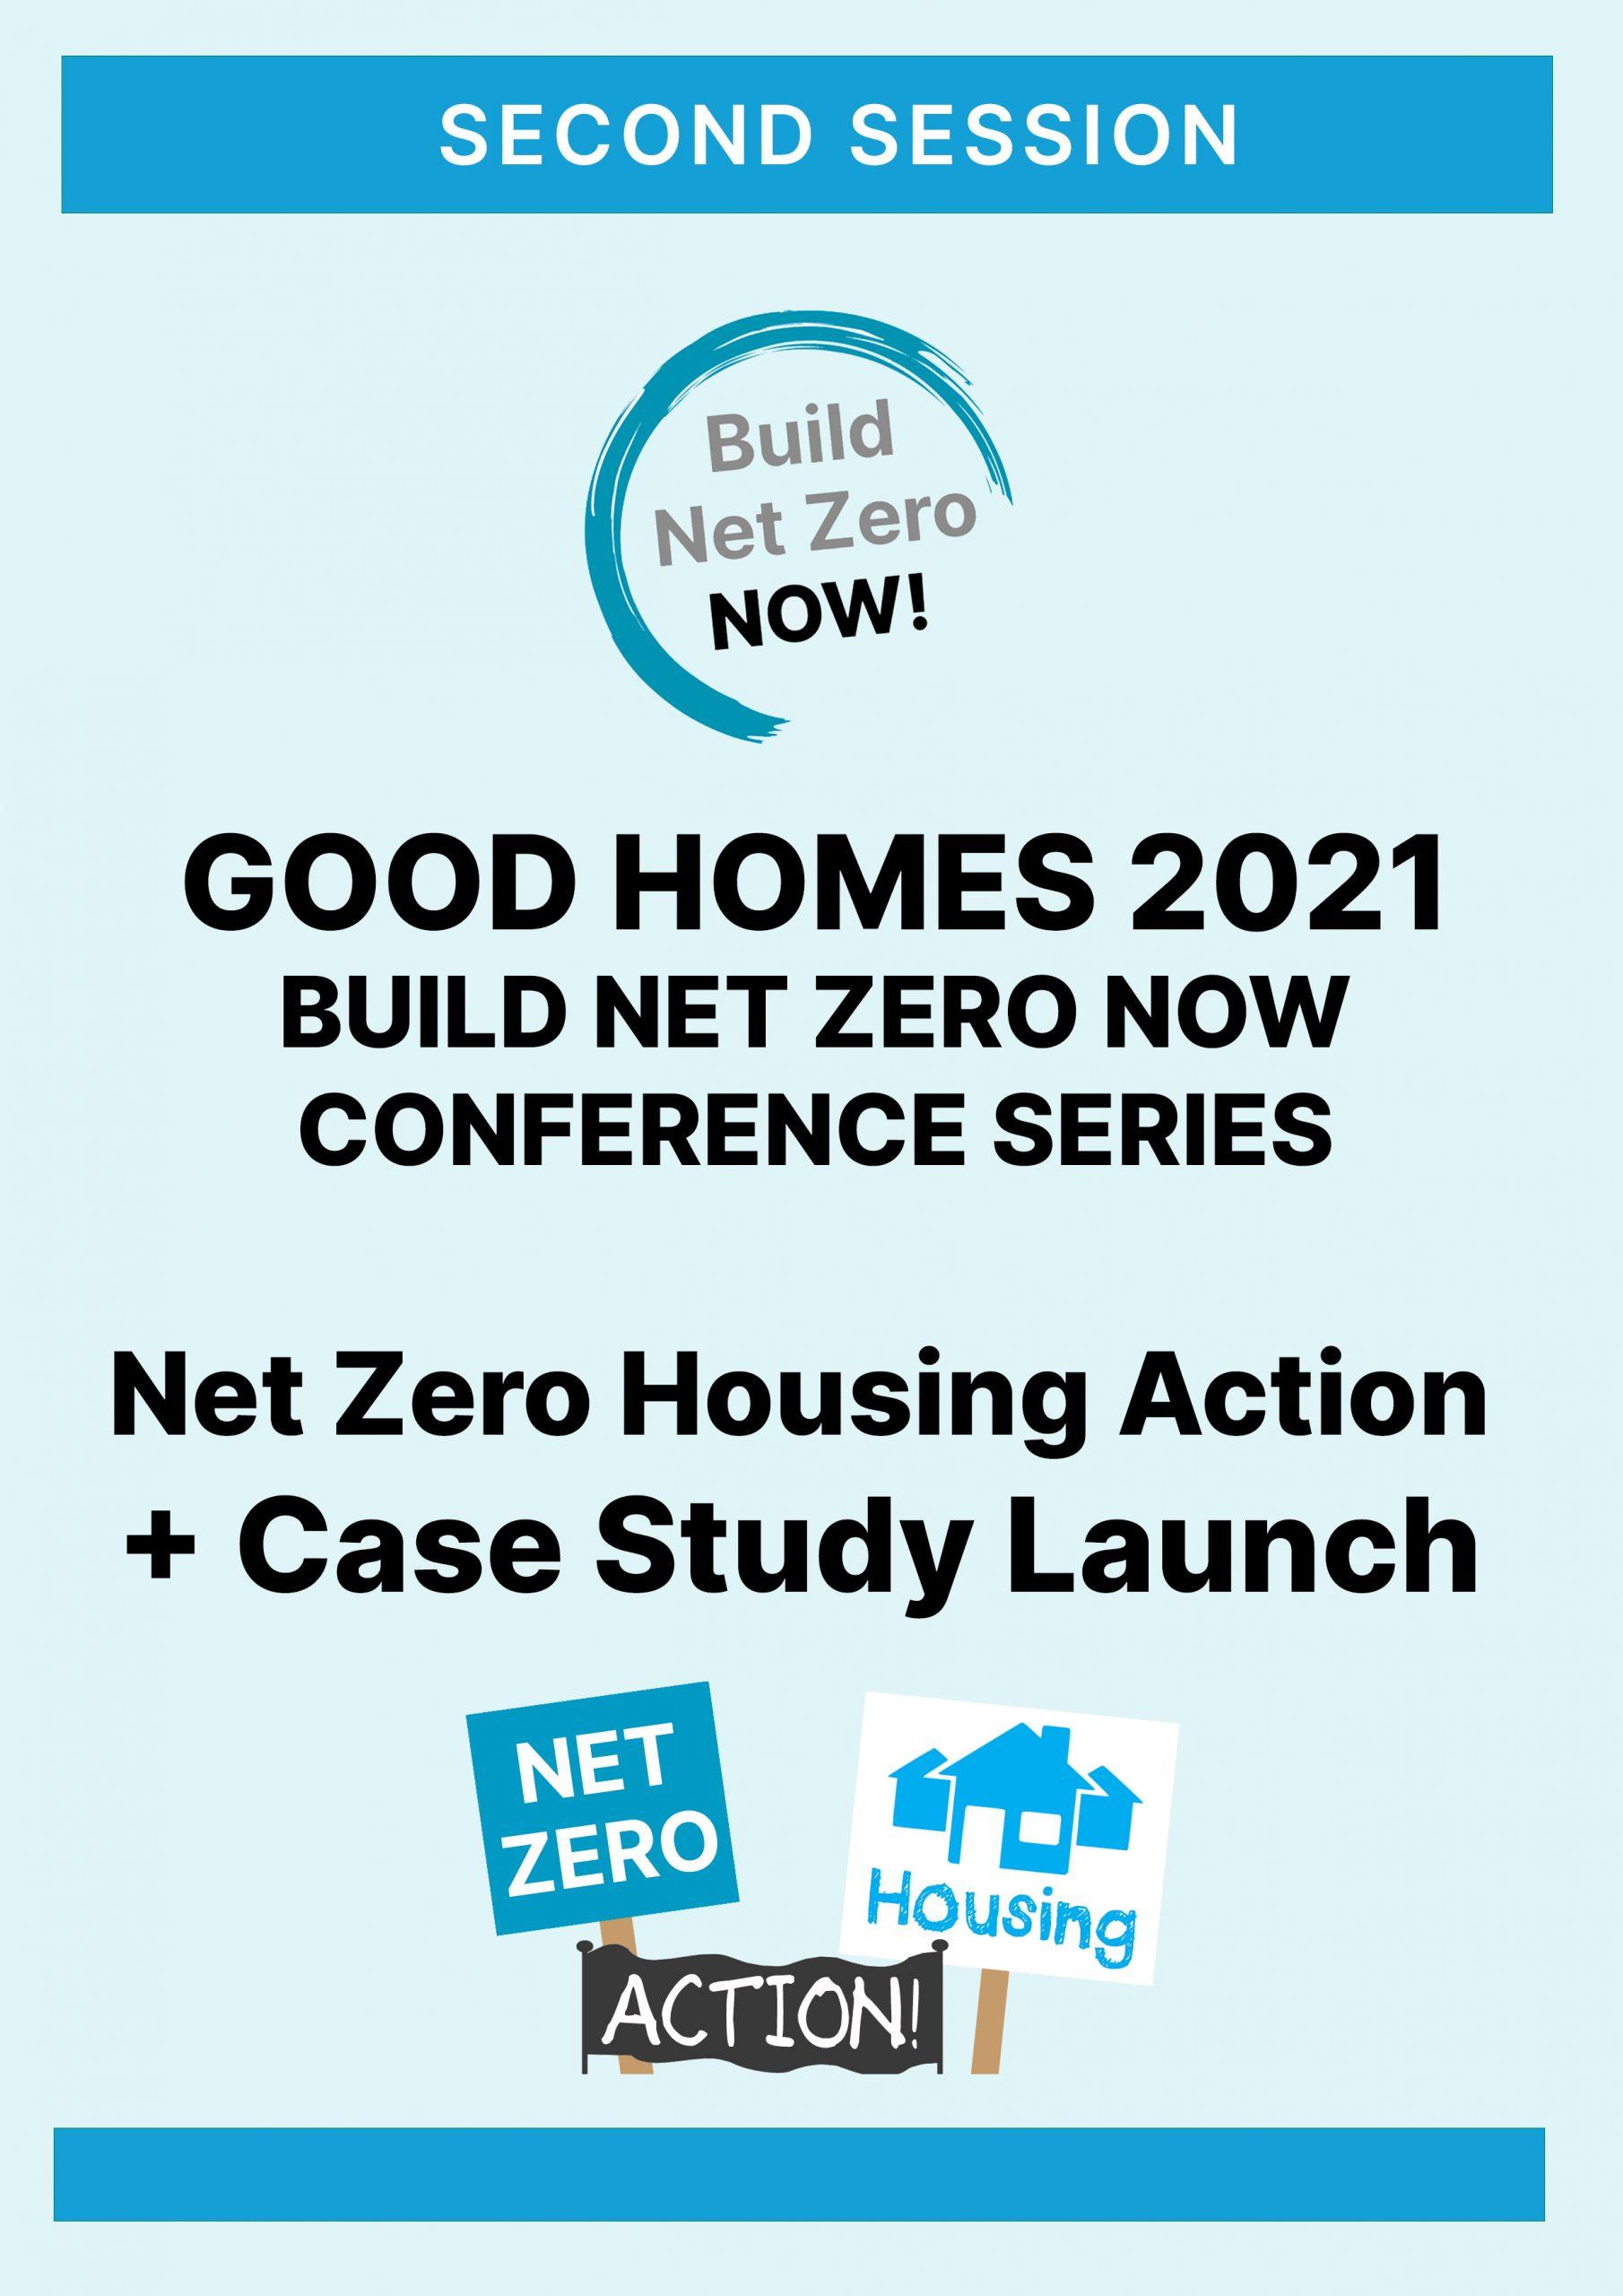 Good Homes 2021 Build Net Zero Now conference series - Net Zero Housing Action + Case Study Launch